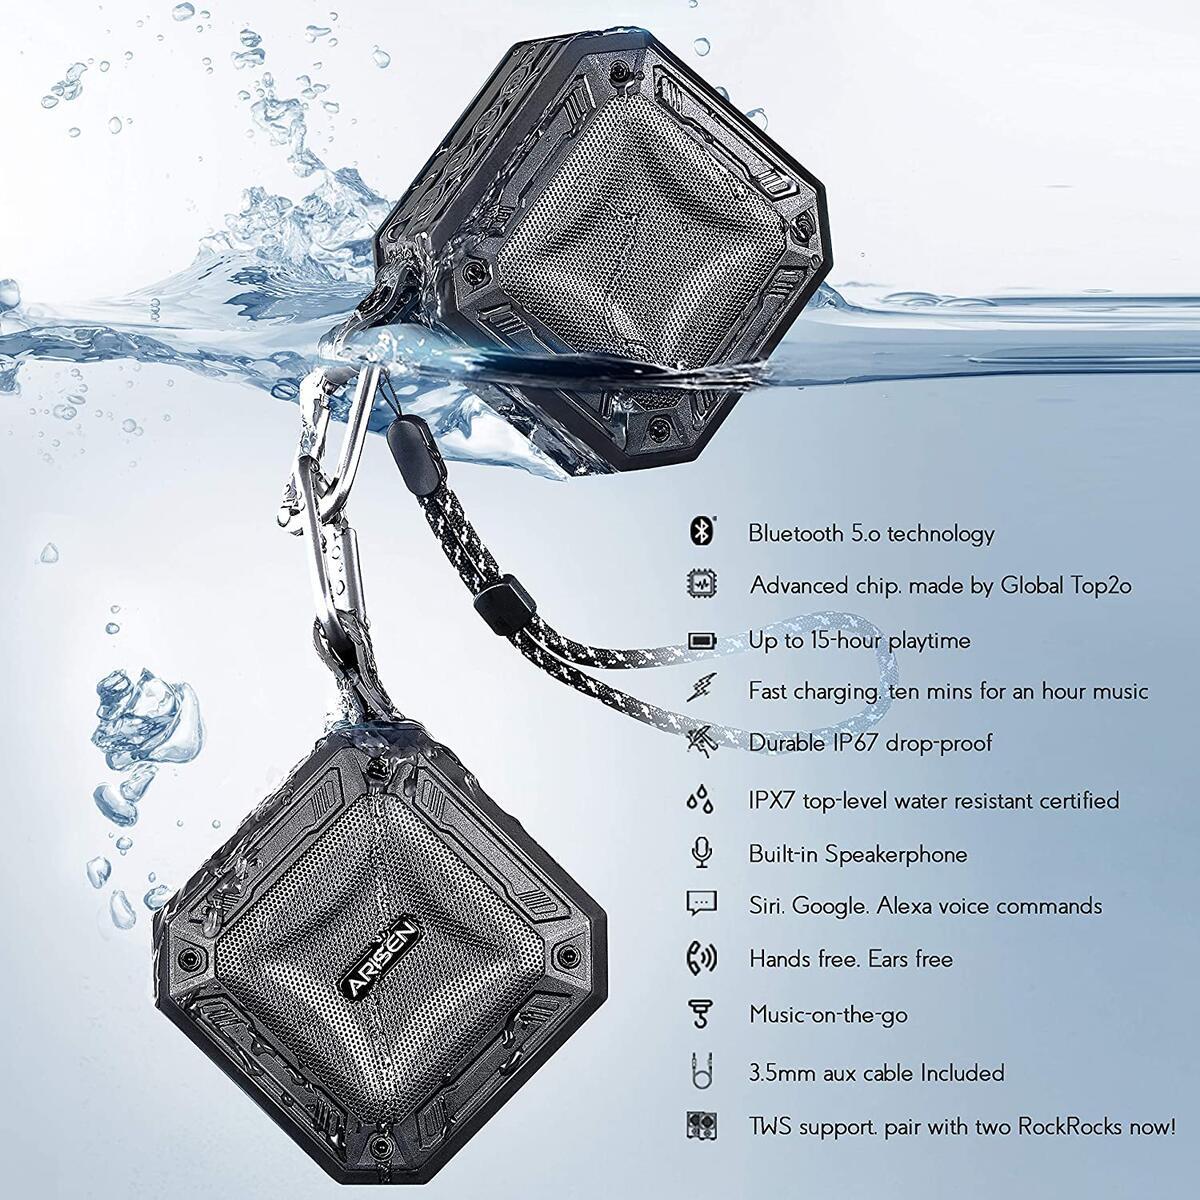 Small Portable Bluetooth Speakers Waterproof, 8W SuperLoud & DeepBass Micro Wireless Speaker, IP67 Water-Resistant, Anti-Drop, Built-in Mic, Support Siri & Google Voice Commands, 16-H Playtime